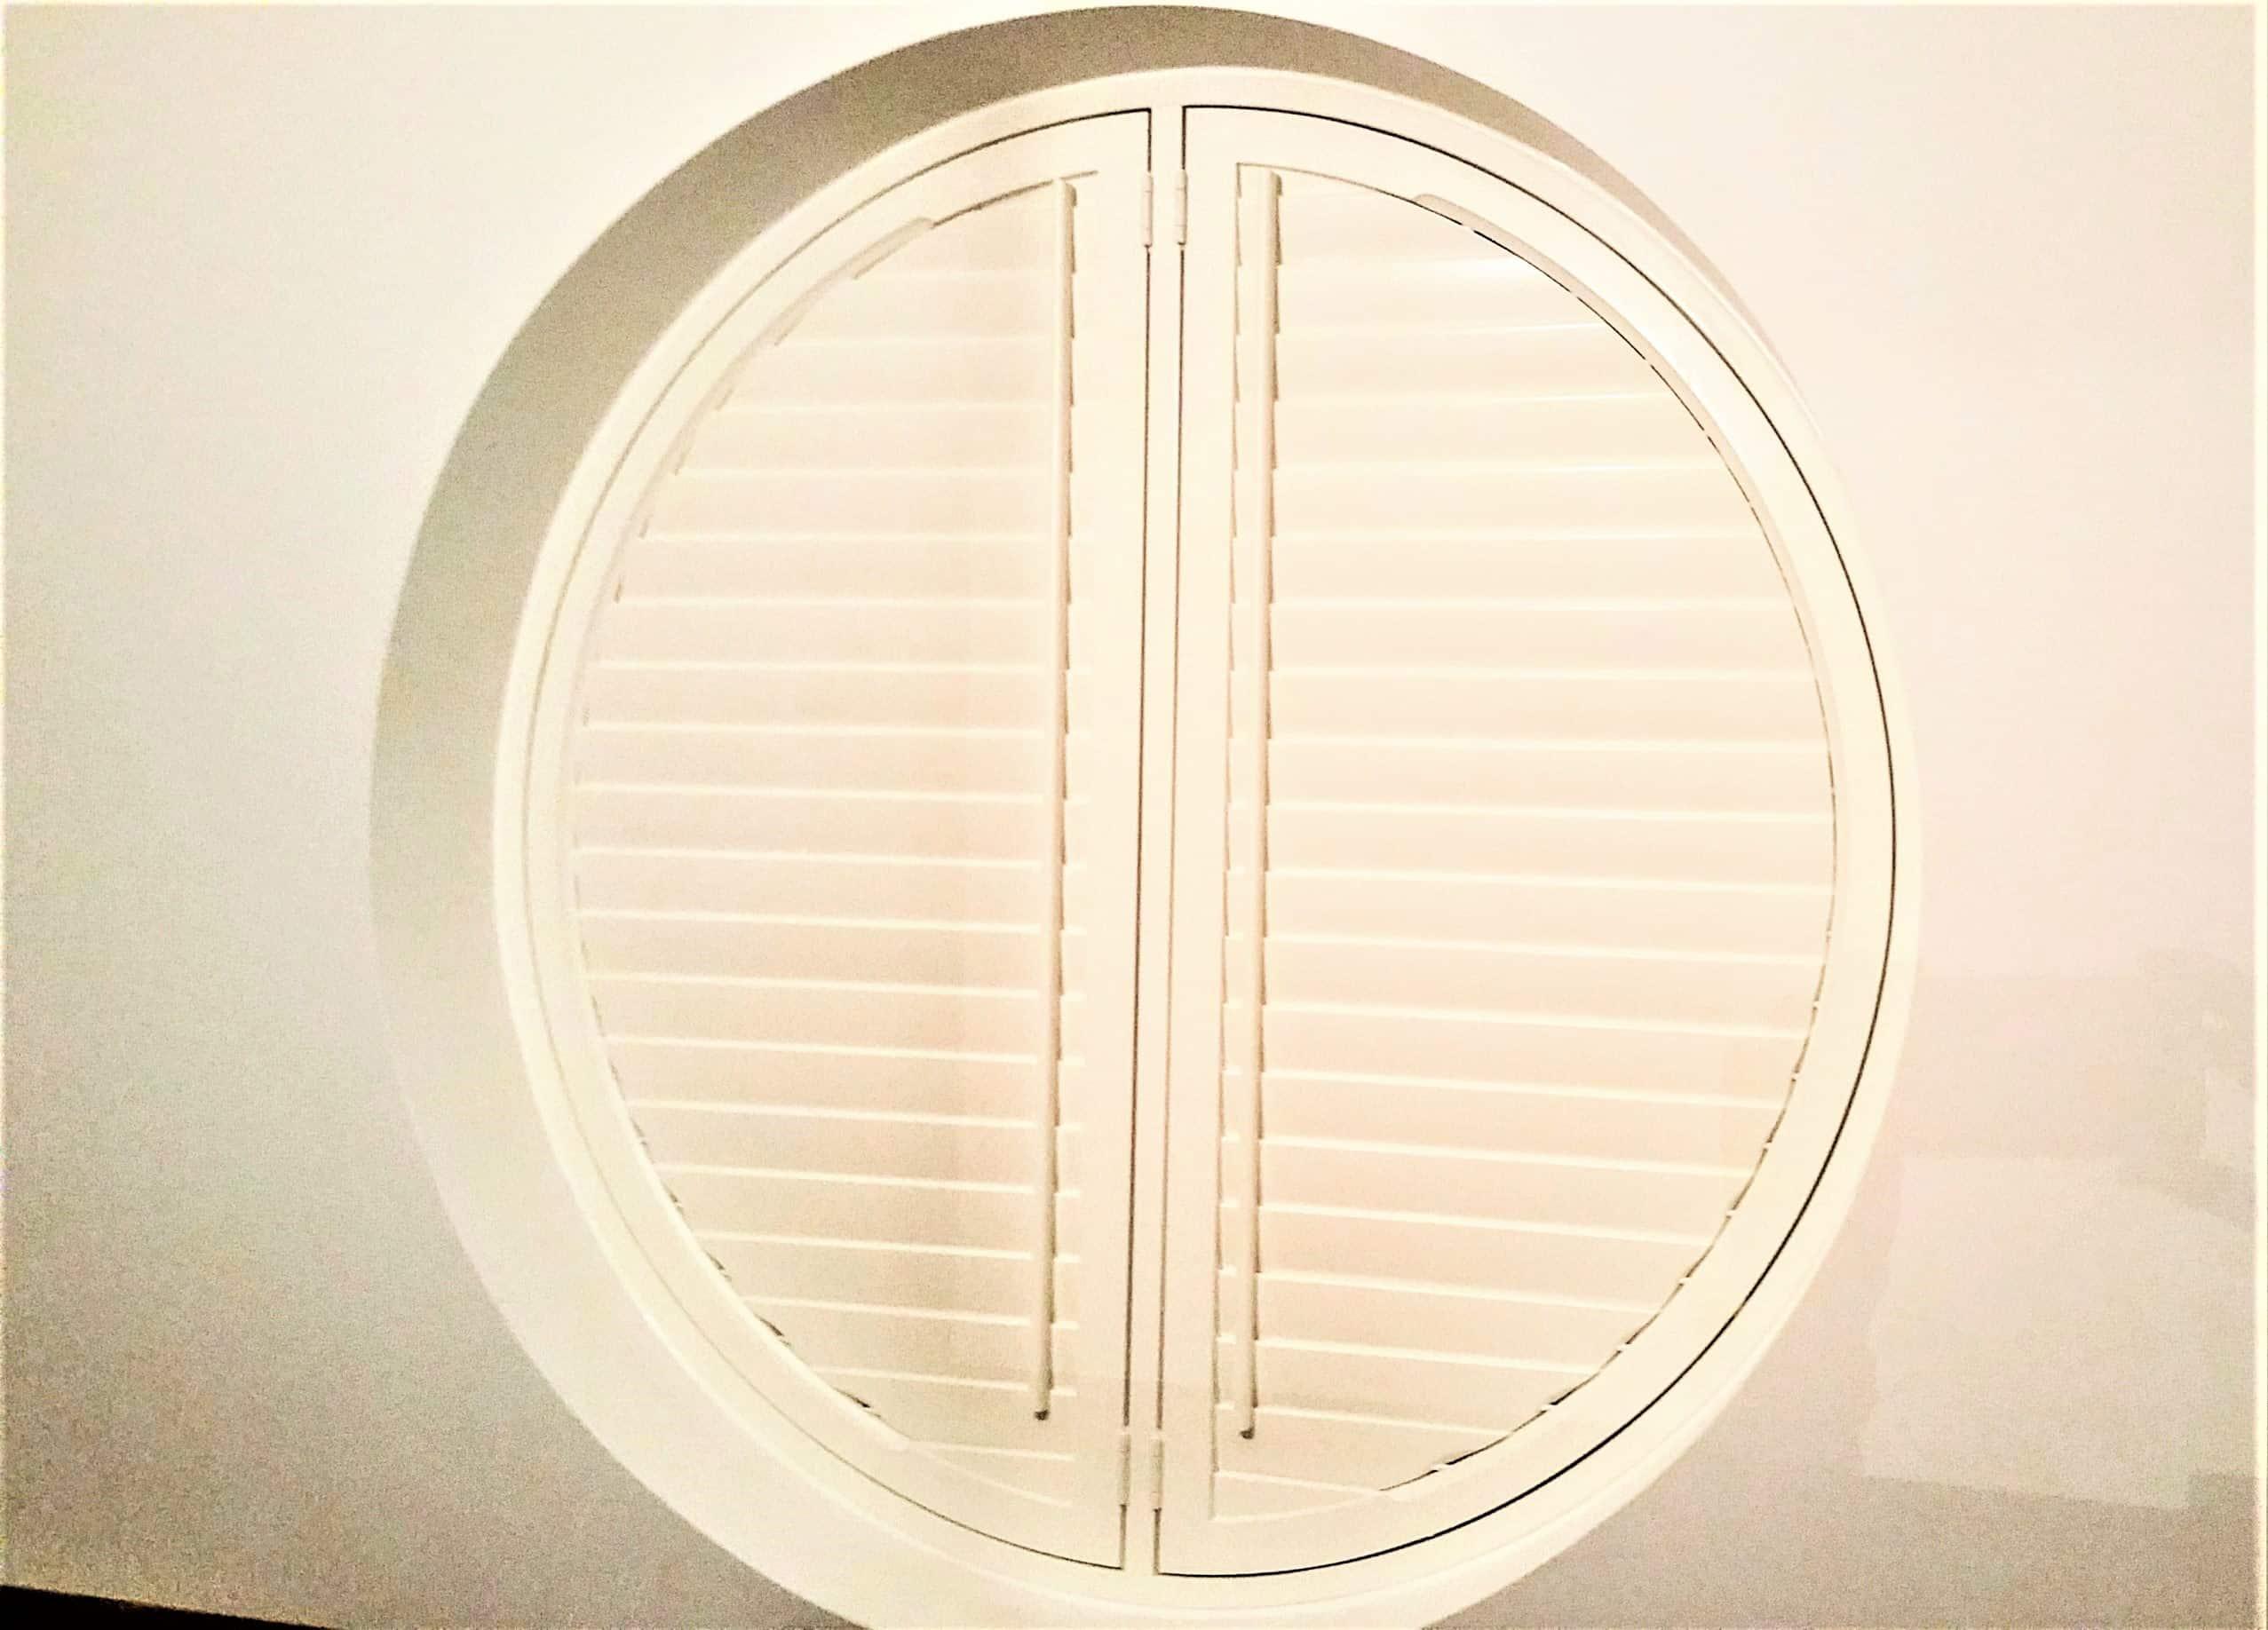 Circle Shutter Doors